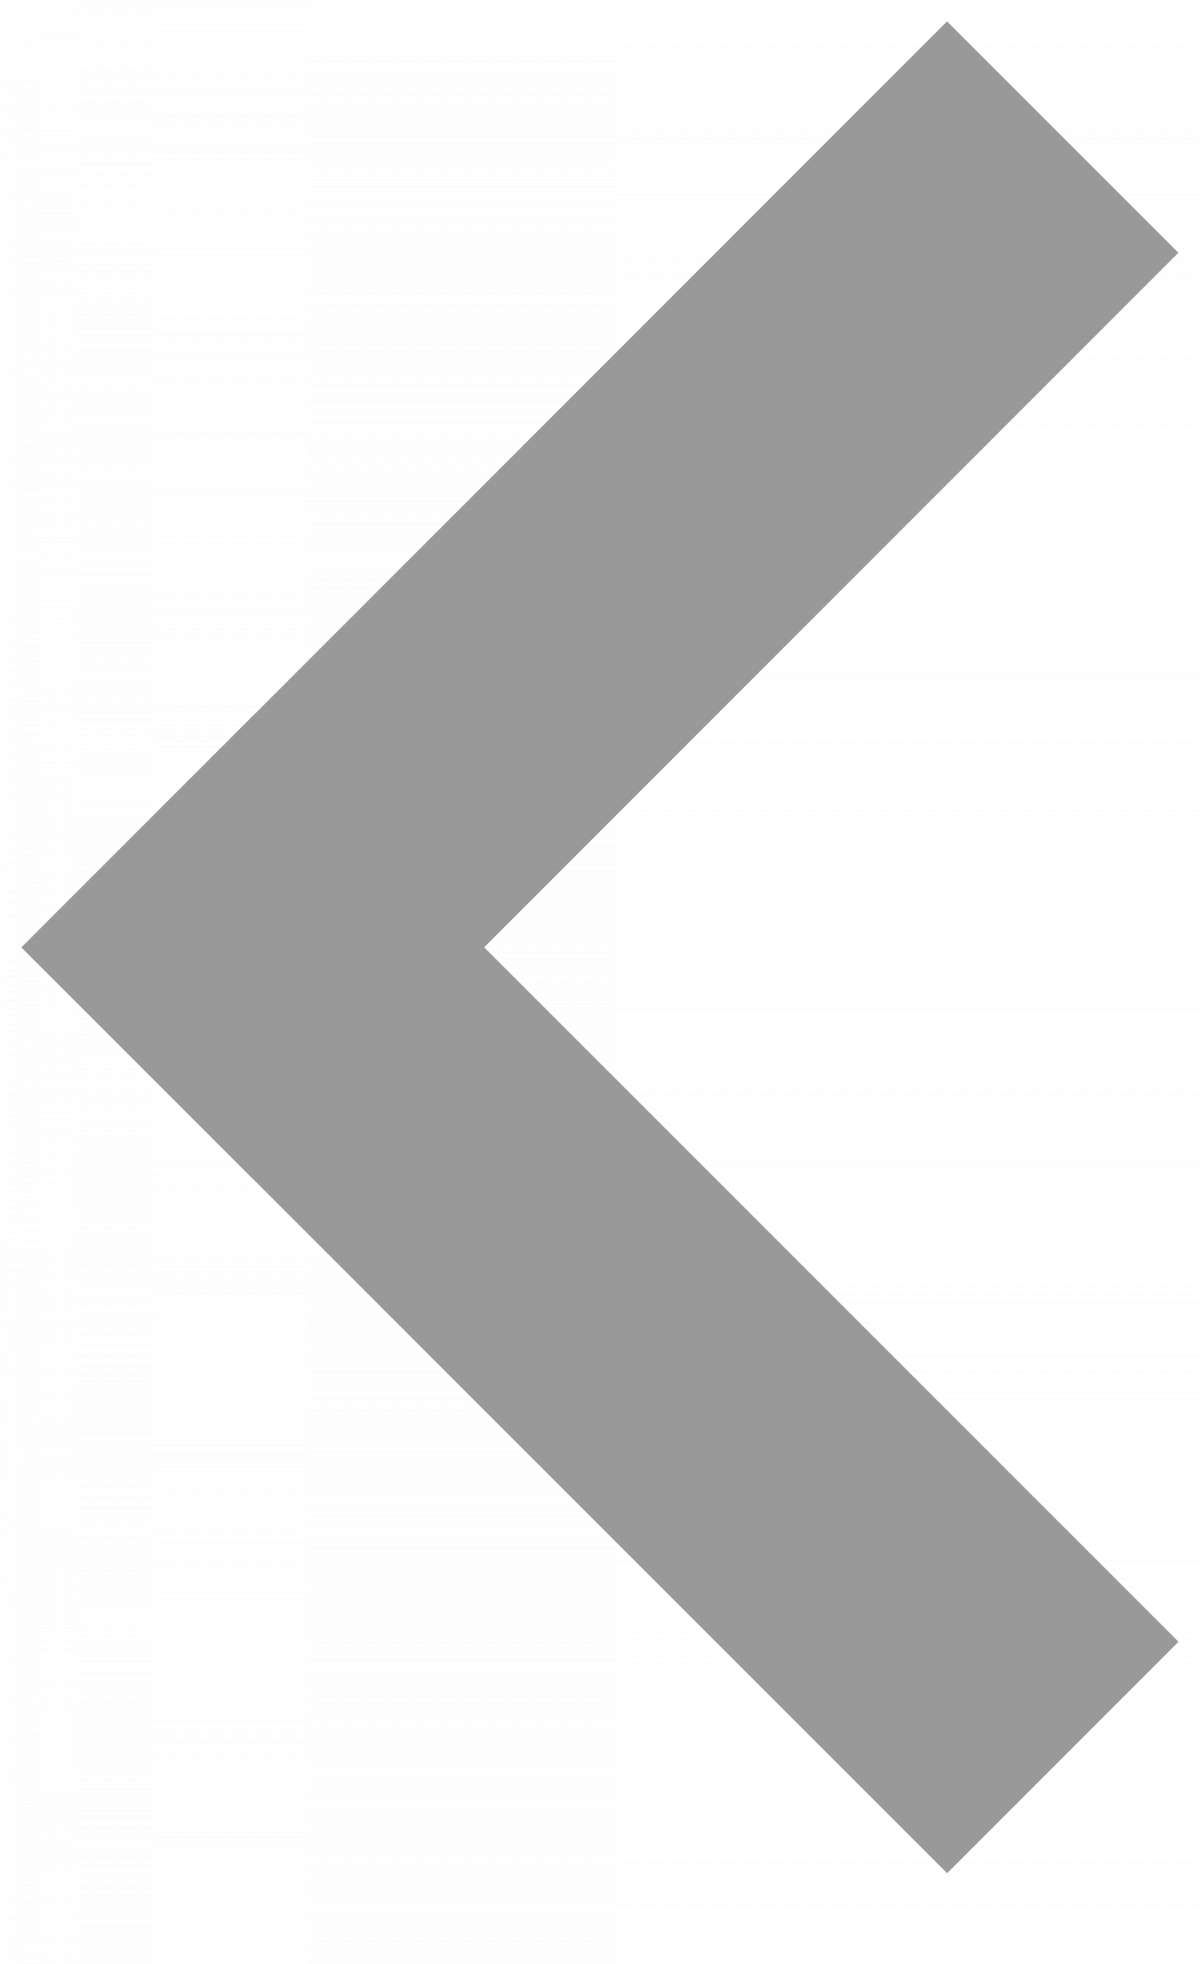 10 Arrow Icon Png White Down Arrow Icon Right Arrow Icon Curved Arrow